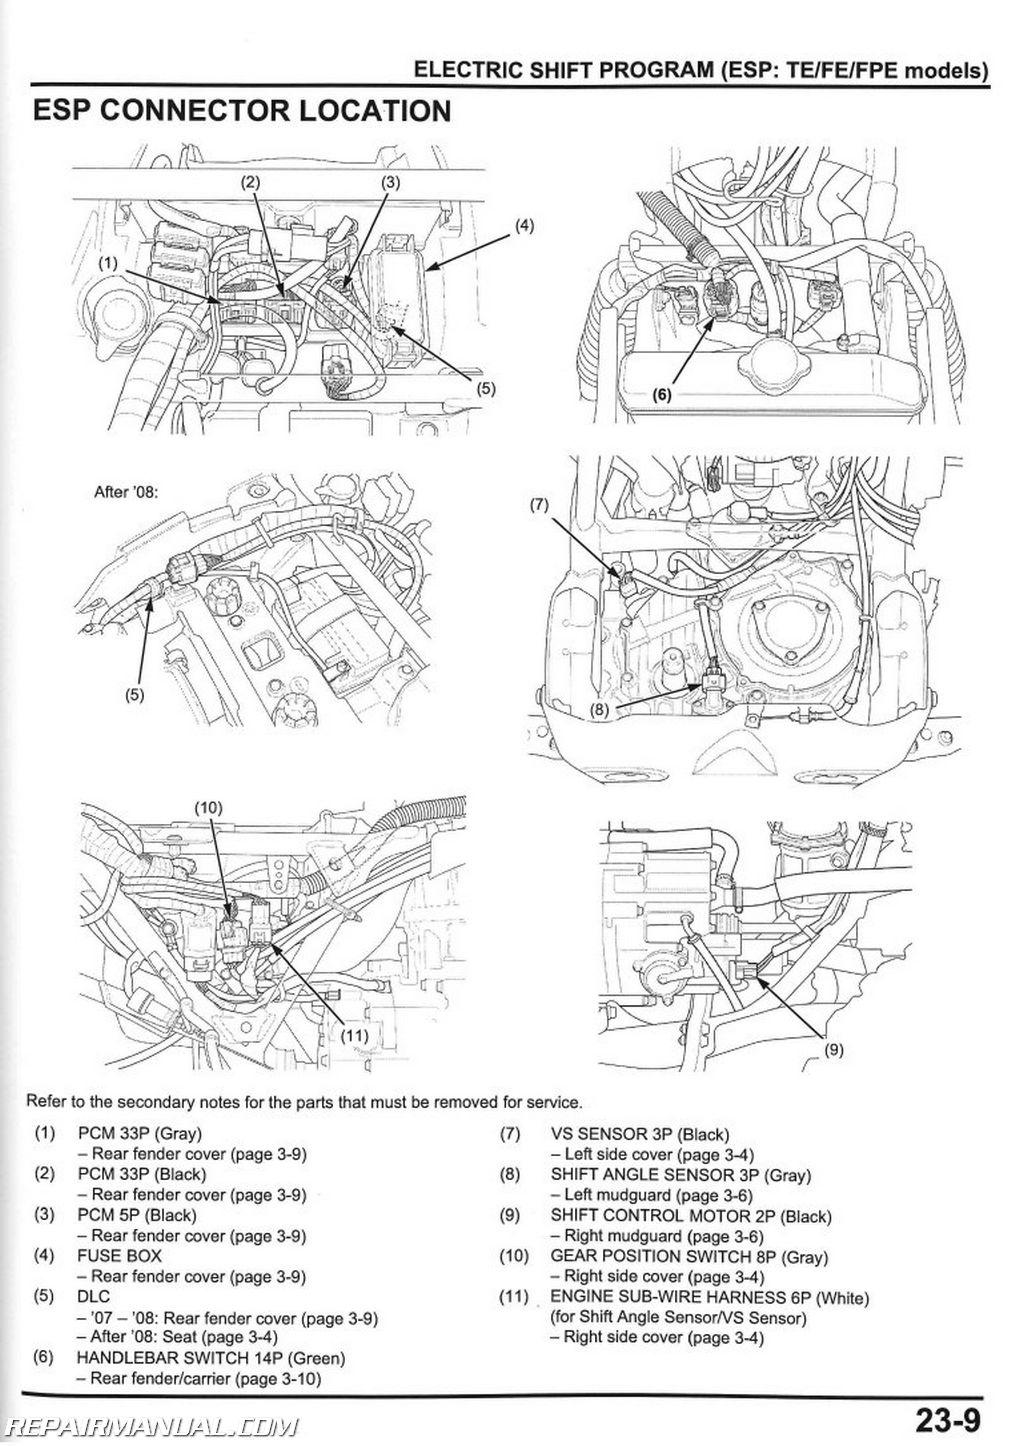 honda trx420 fourtrax rancher service manual 2007 2008